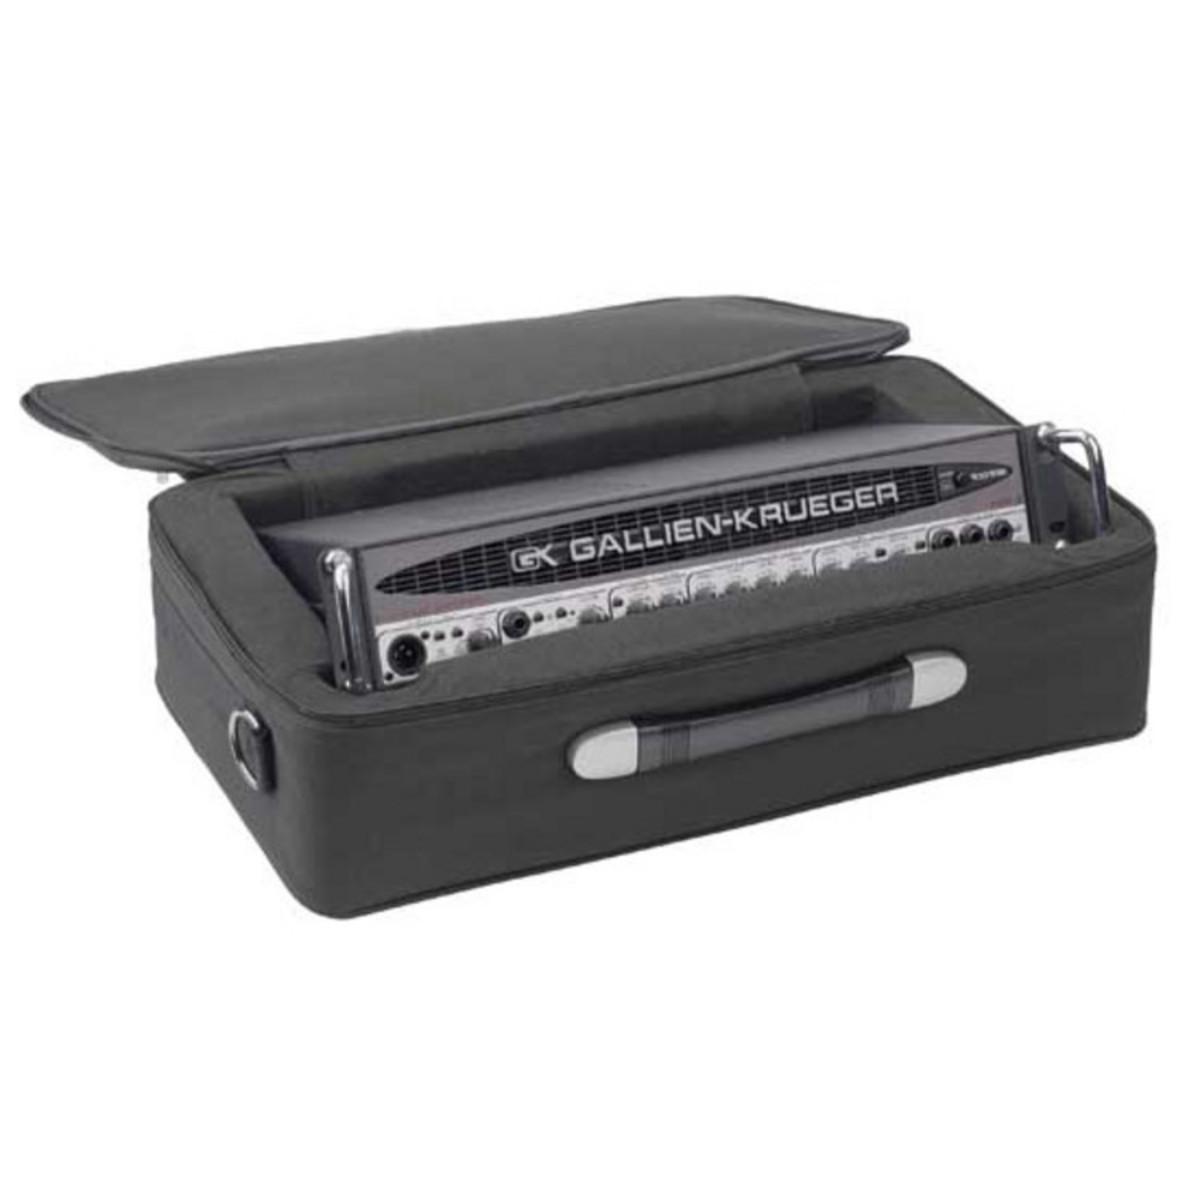 disc gallien krueger 400rb 700rb 1001rb carrying case at gear4music. Black Bedroom Furniture Sets. Home Design Ideas